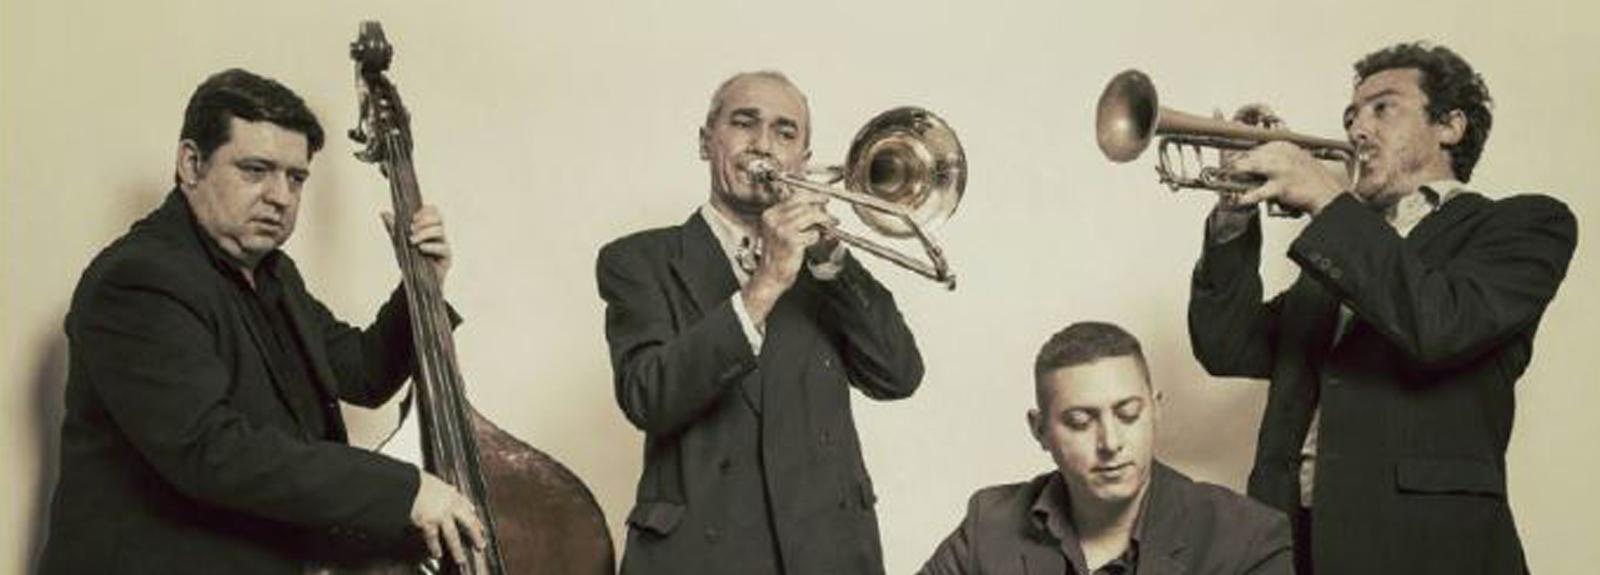 Concert du Central Swing Quartet